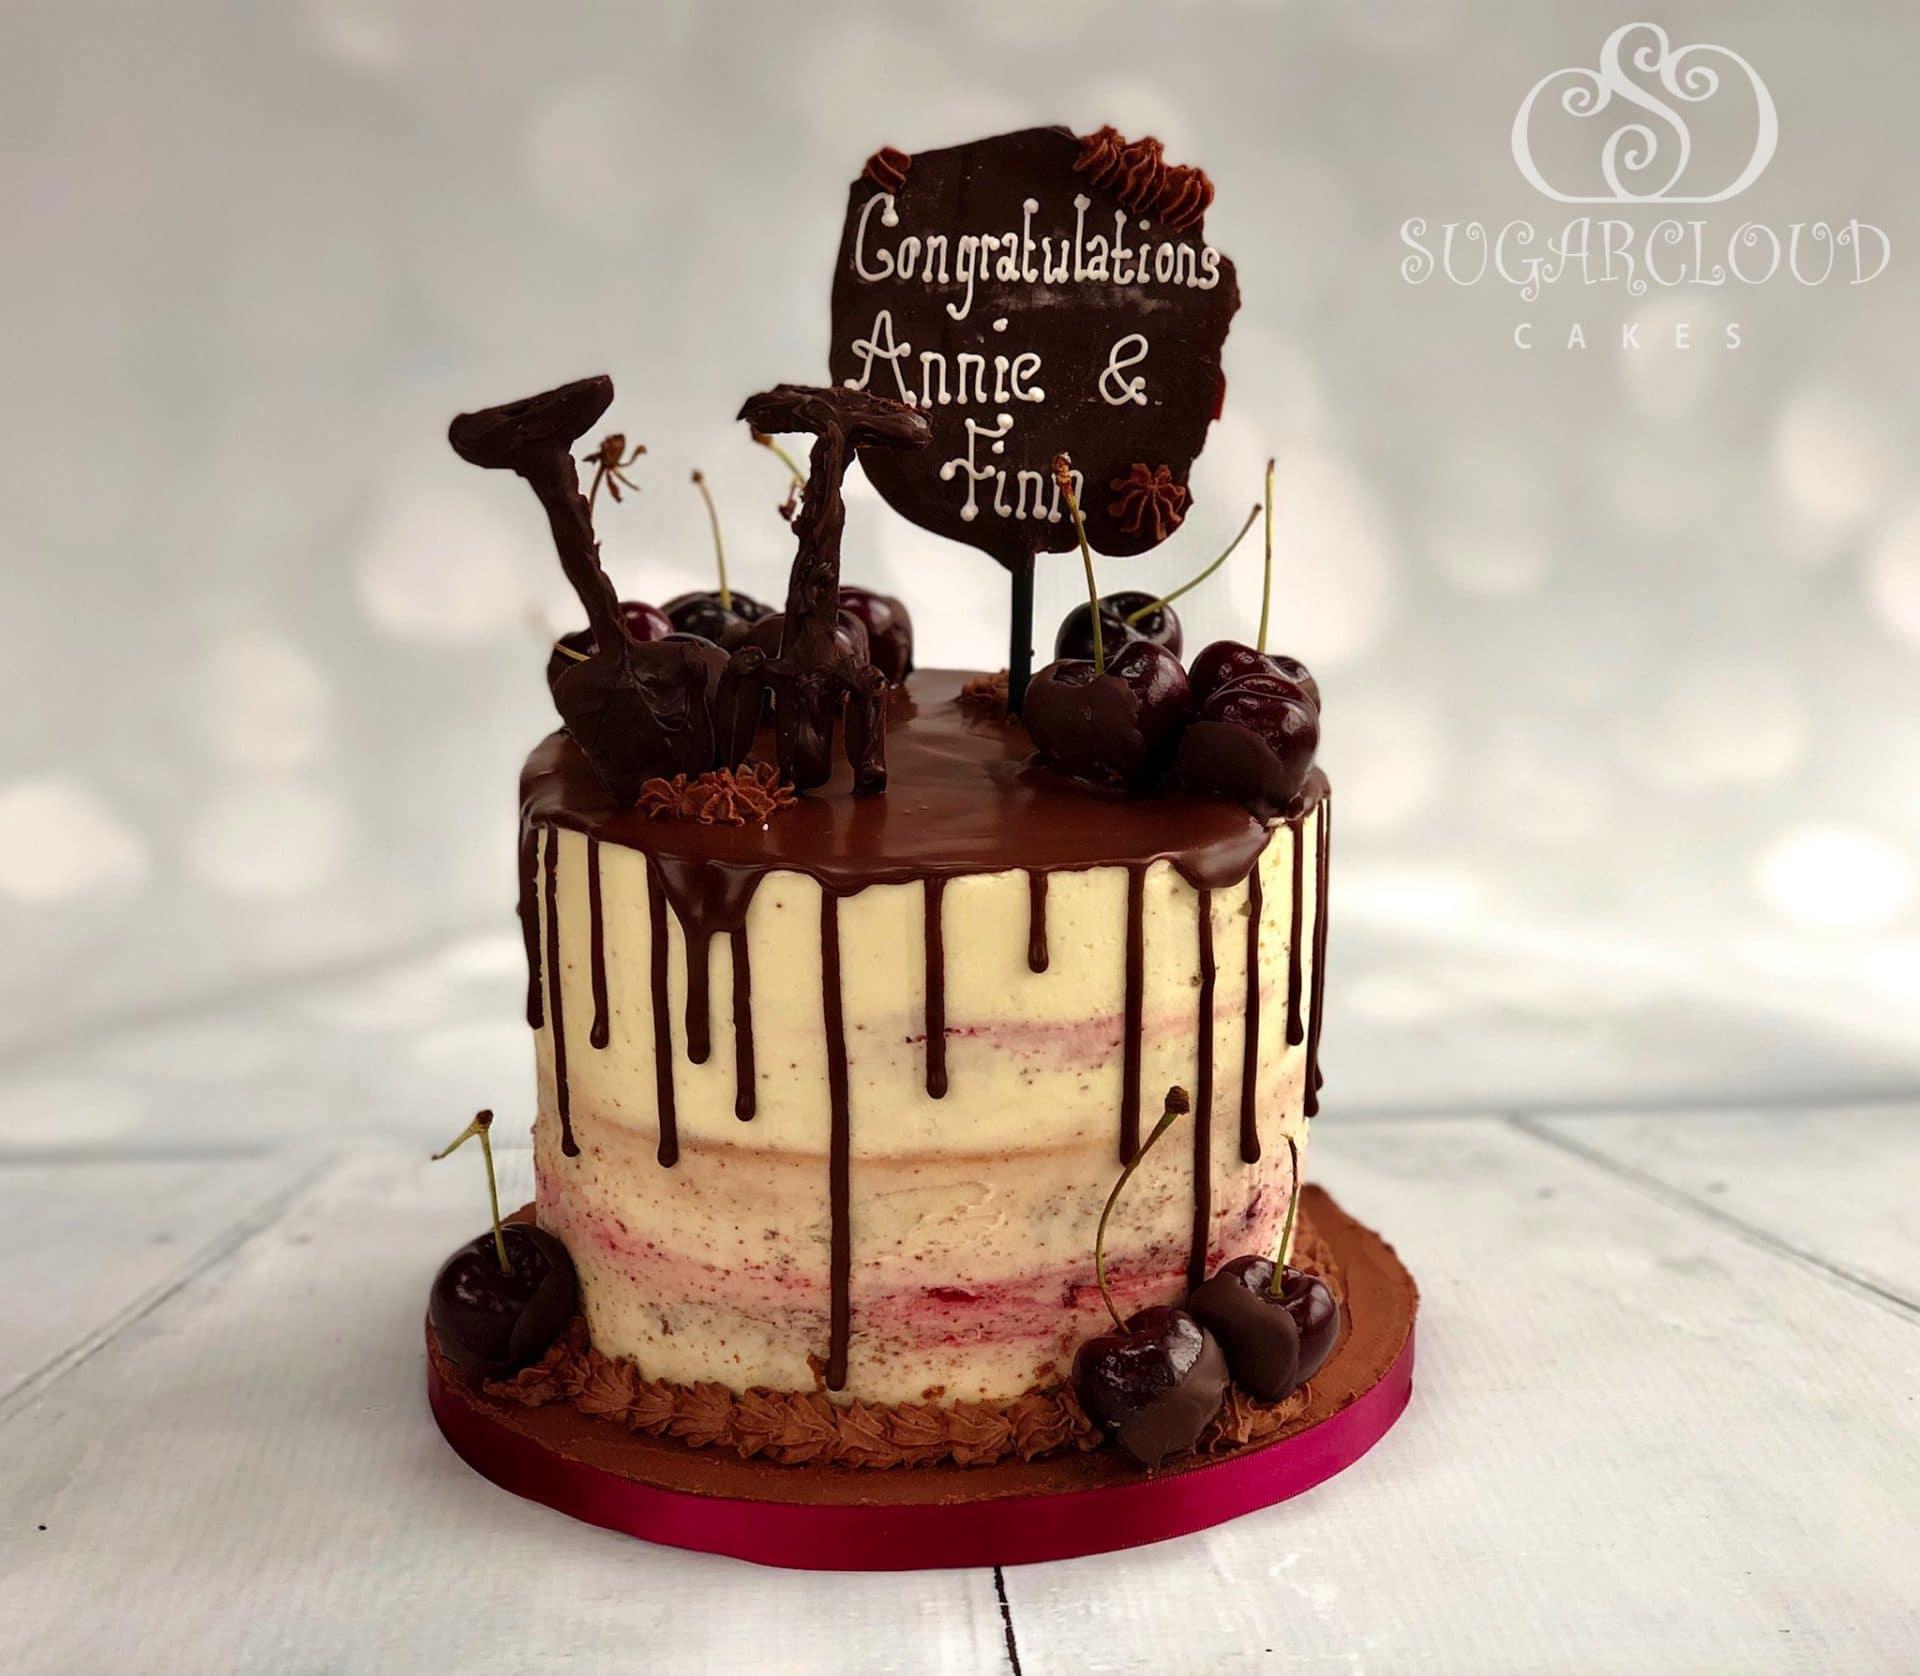 Phenomenal Sugar Cloud Cakes Cake Designer Haslington Crewe Cheshire A Funny Birthday Cards Online Fluifree Goldxyz